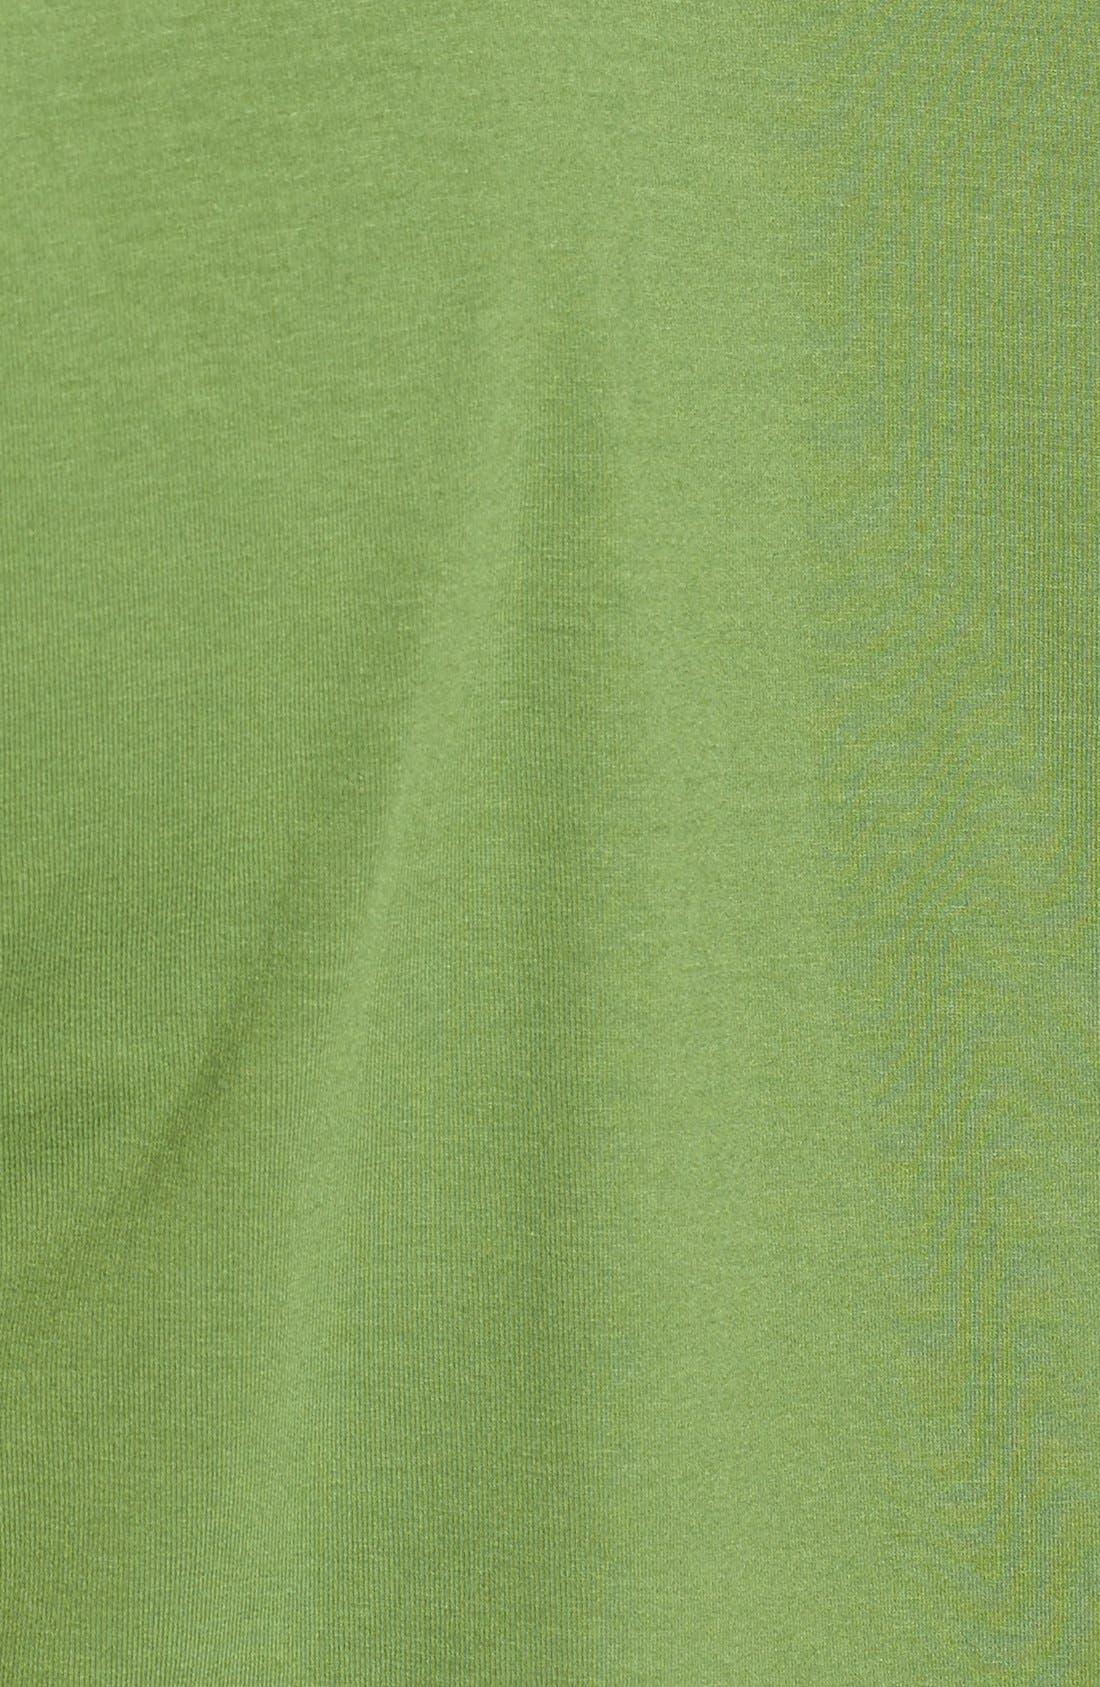 Alternate Image 5  - Vince Camuto Pleat V-Neck Knit Top (Plus Size)